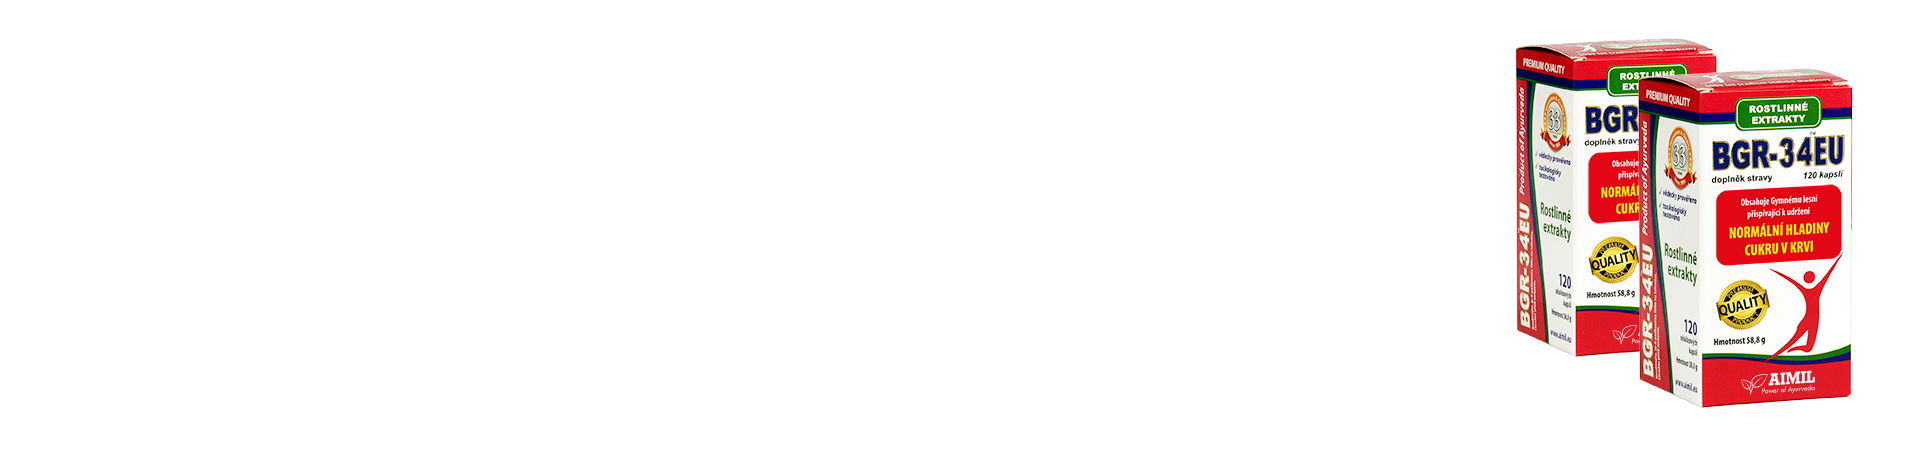 Aimil-banner-BGR-1-1